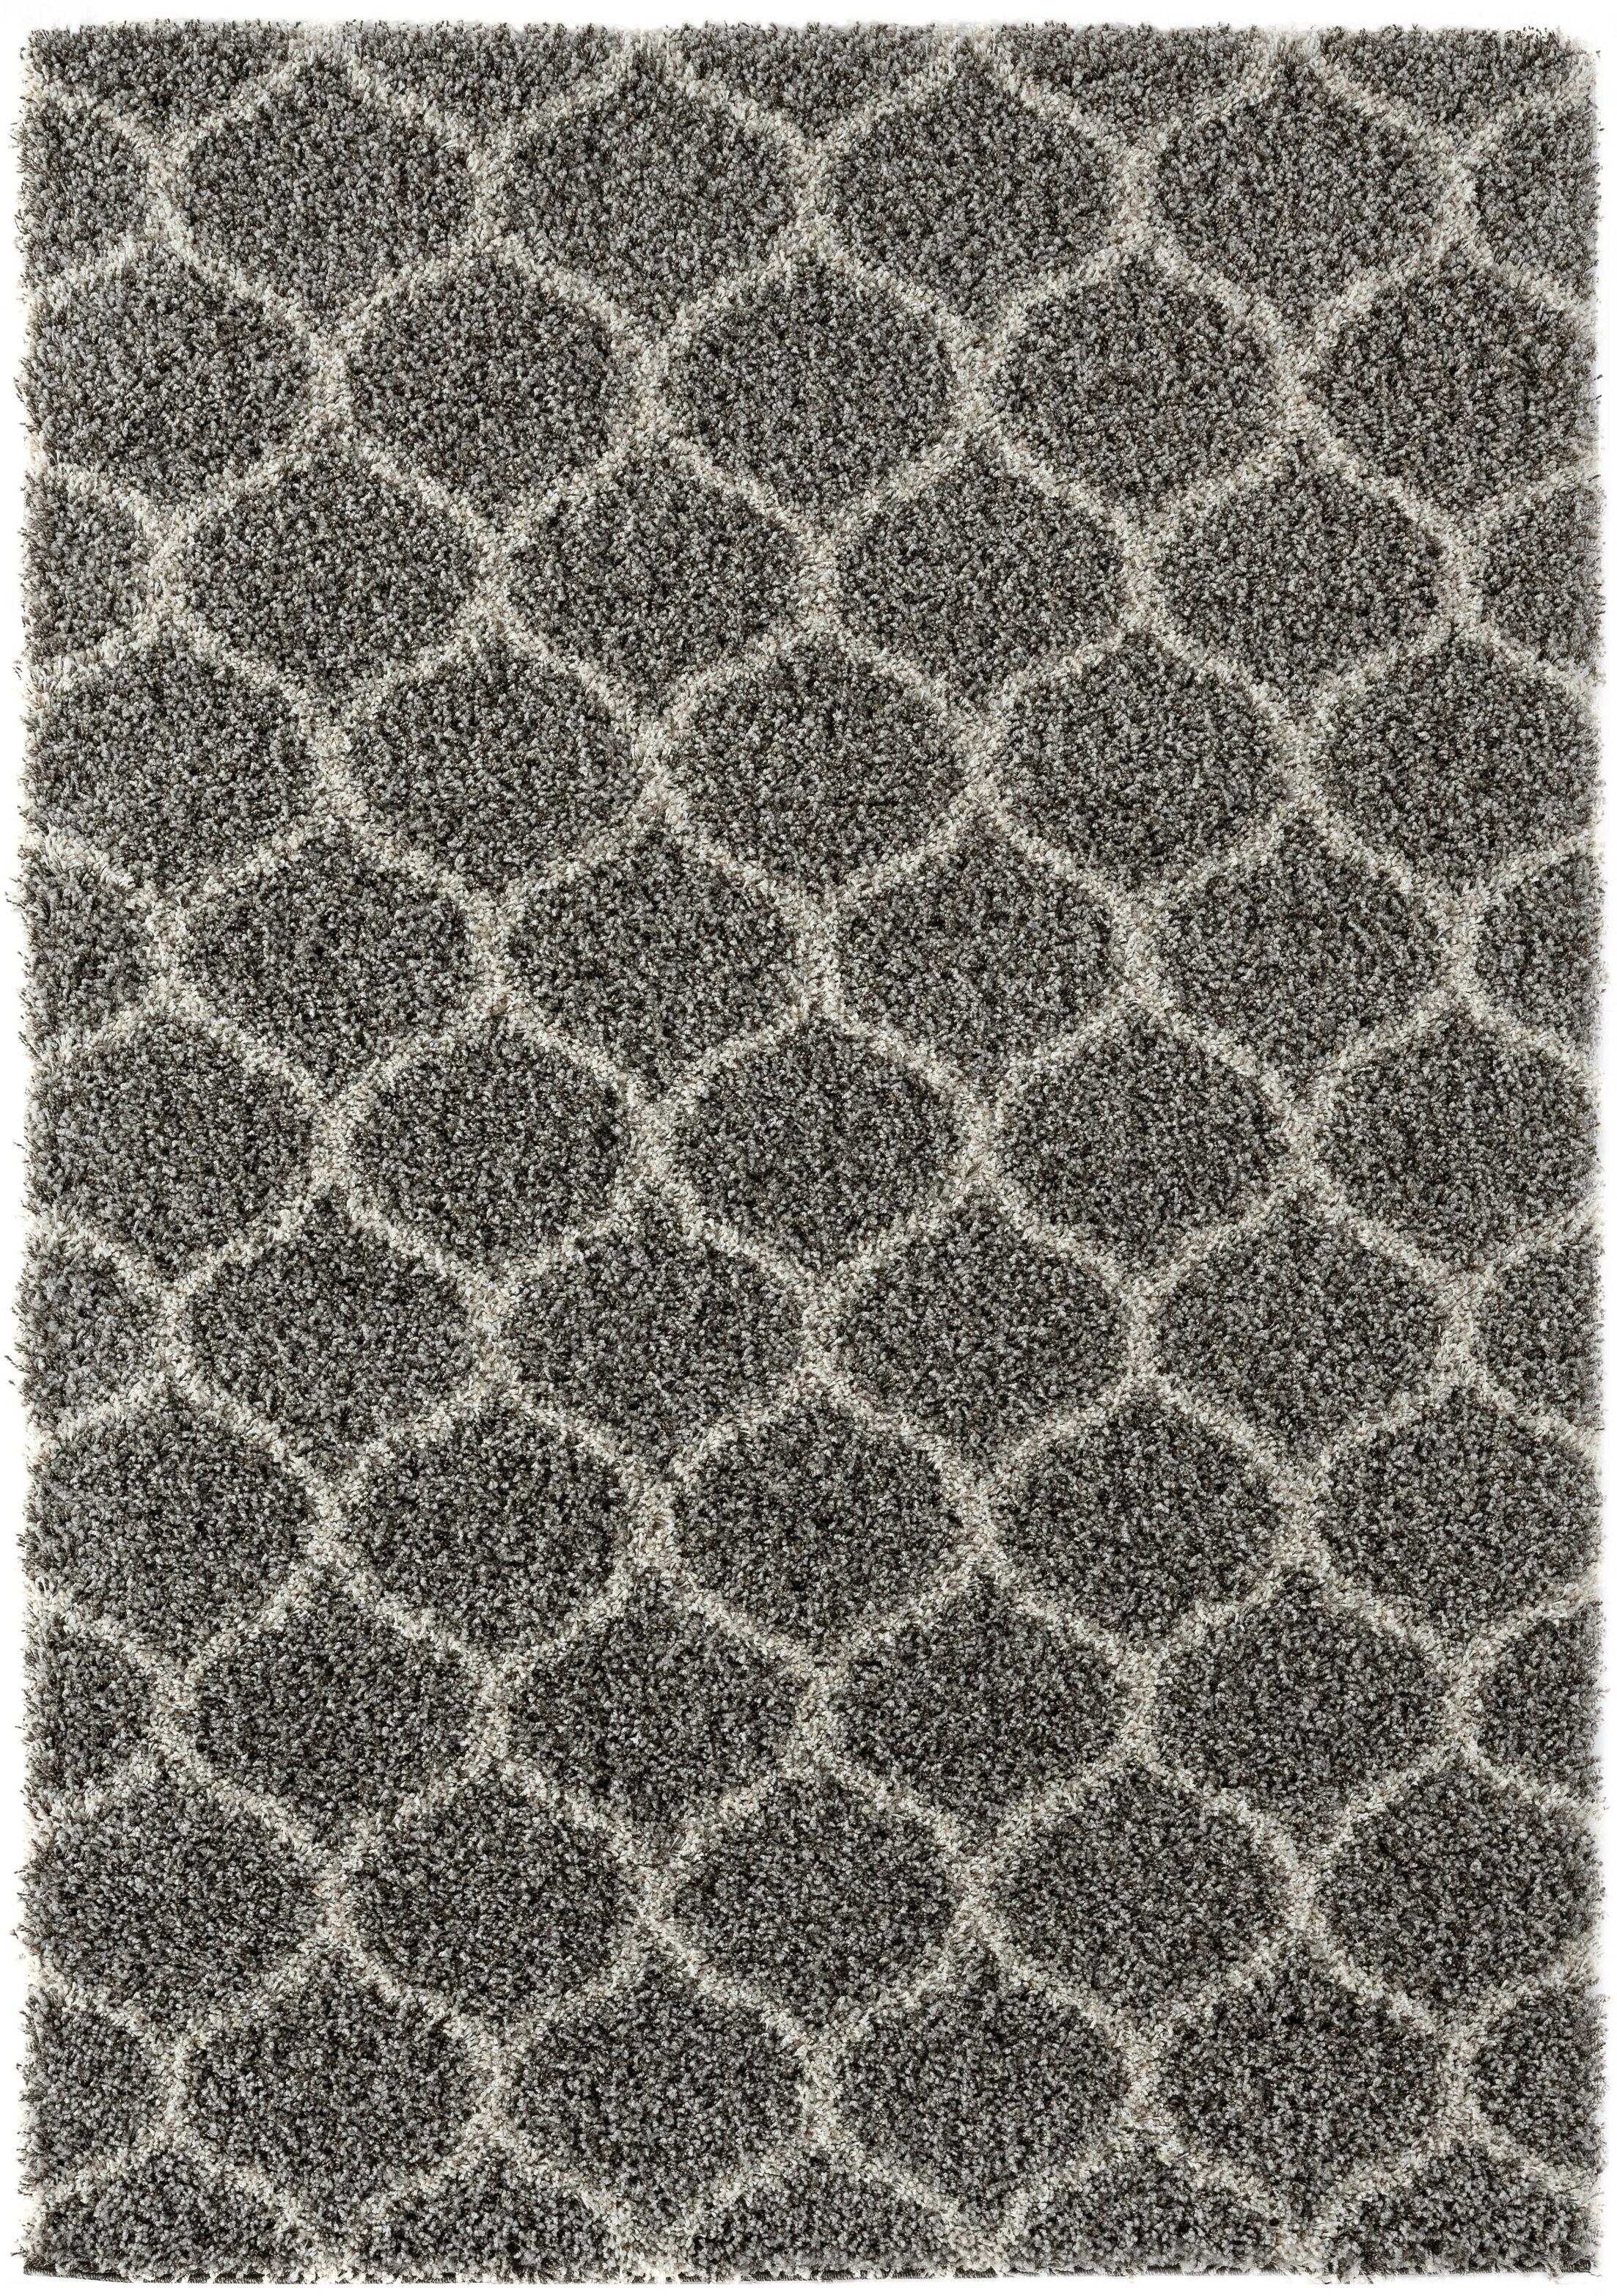 Langner Gray Area Rug Rug Size: Rectangle 5' x 7'2